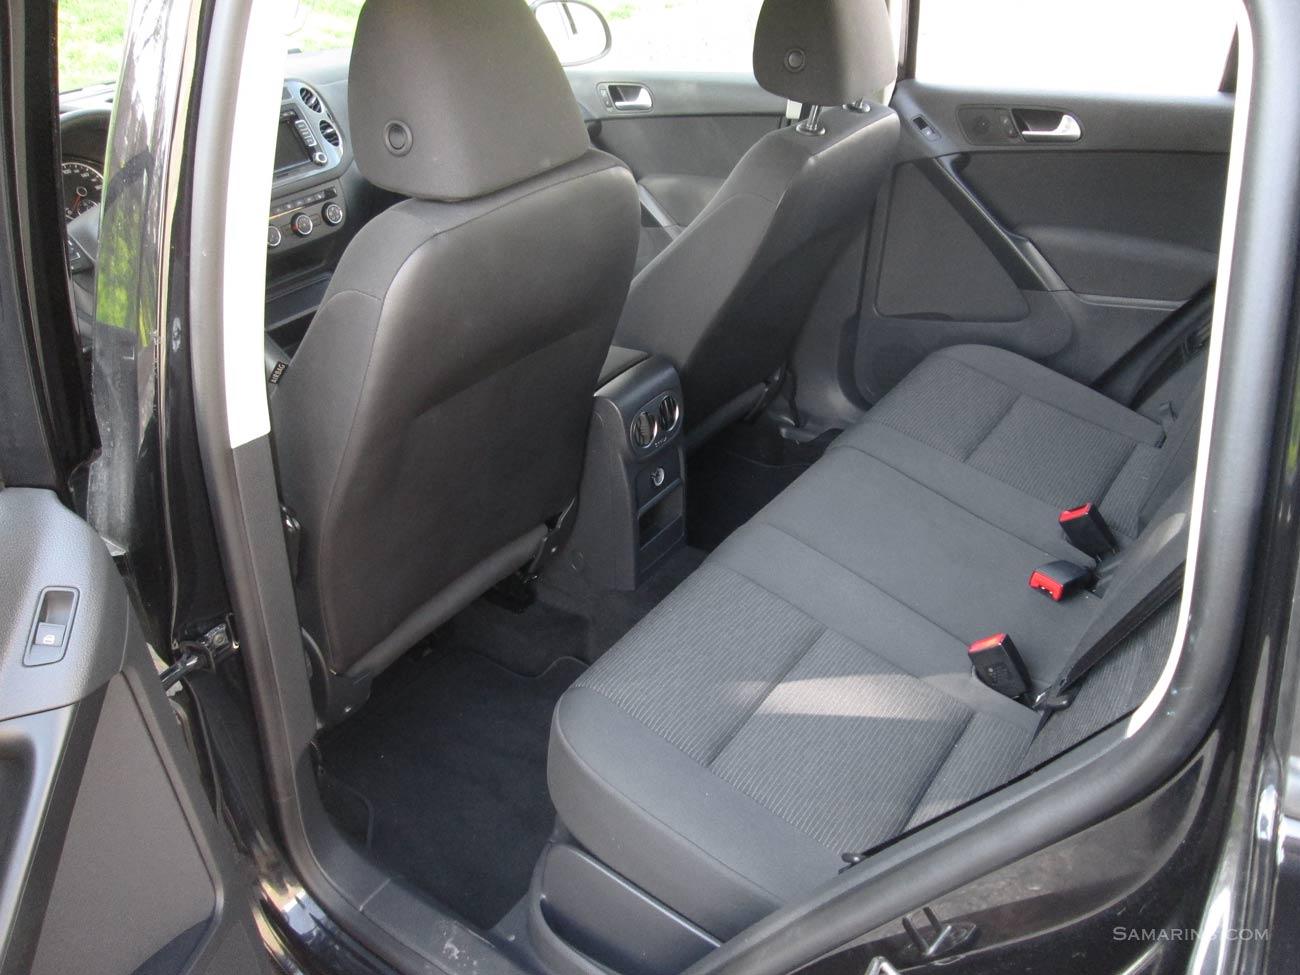 Volkswagen Tiguan 2009-2017: problems and fixes, fuel